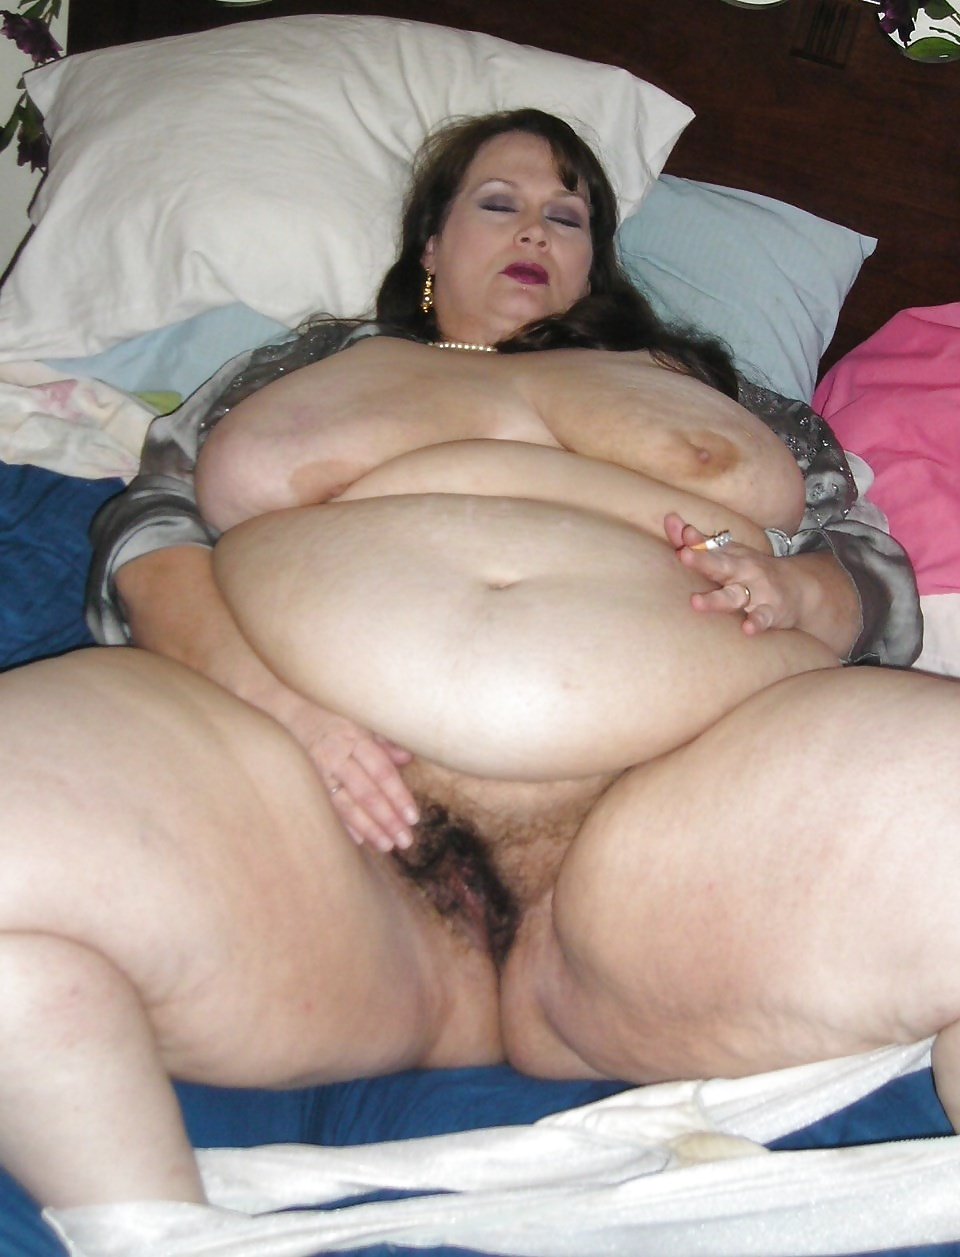 Fat milfs pics and hot nude milfs